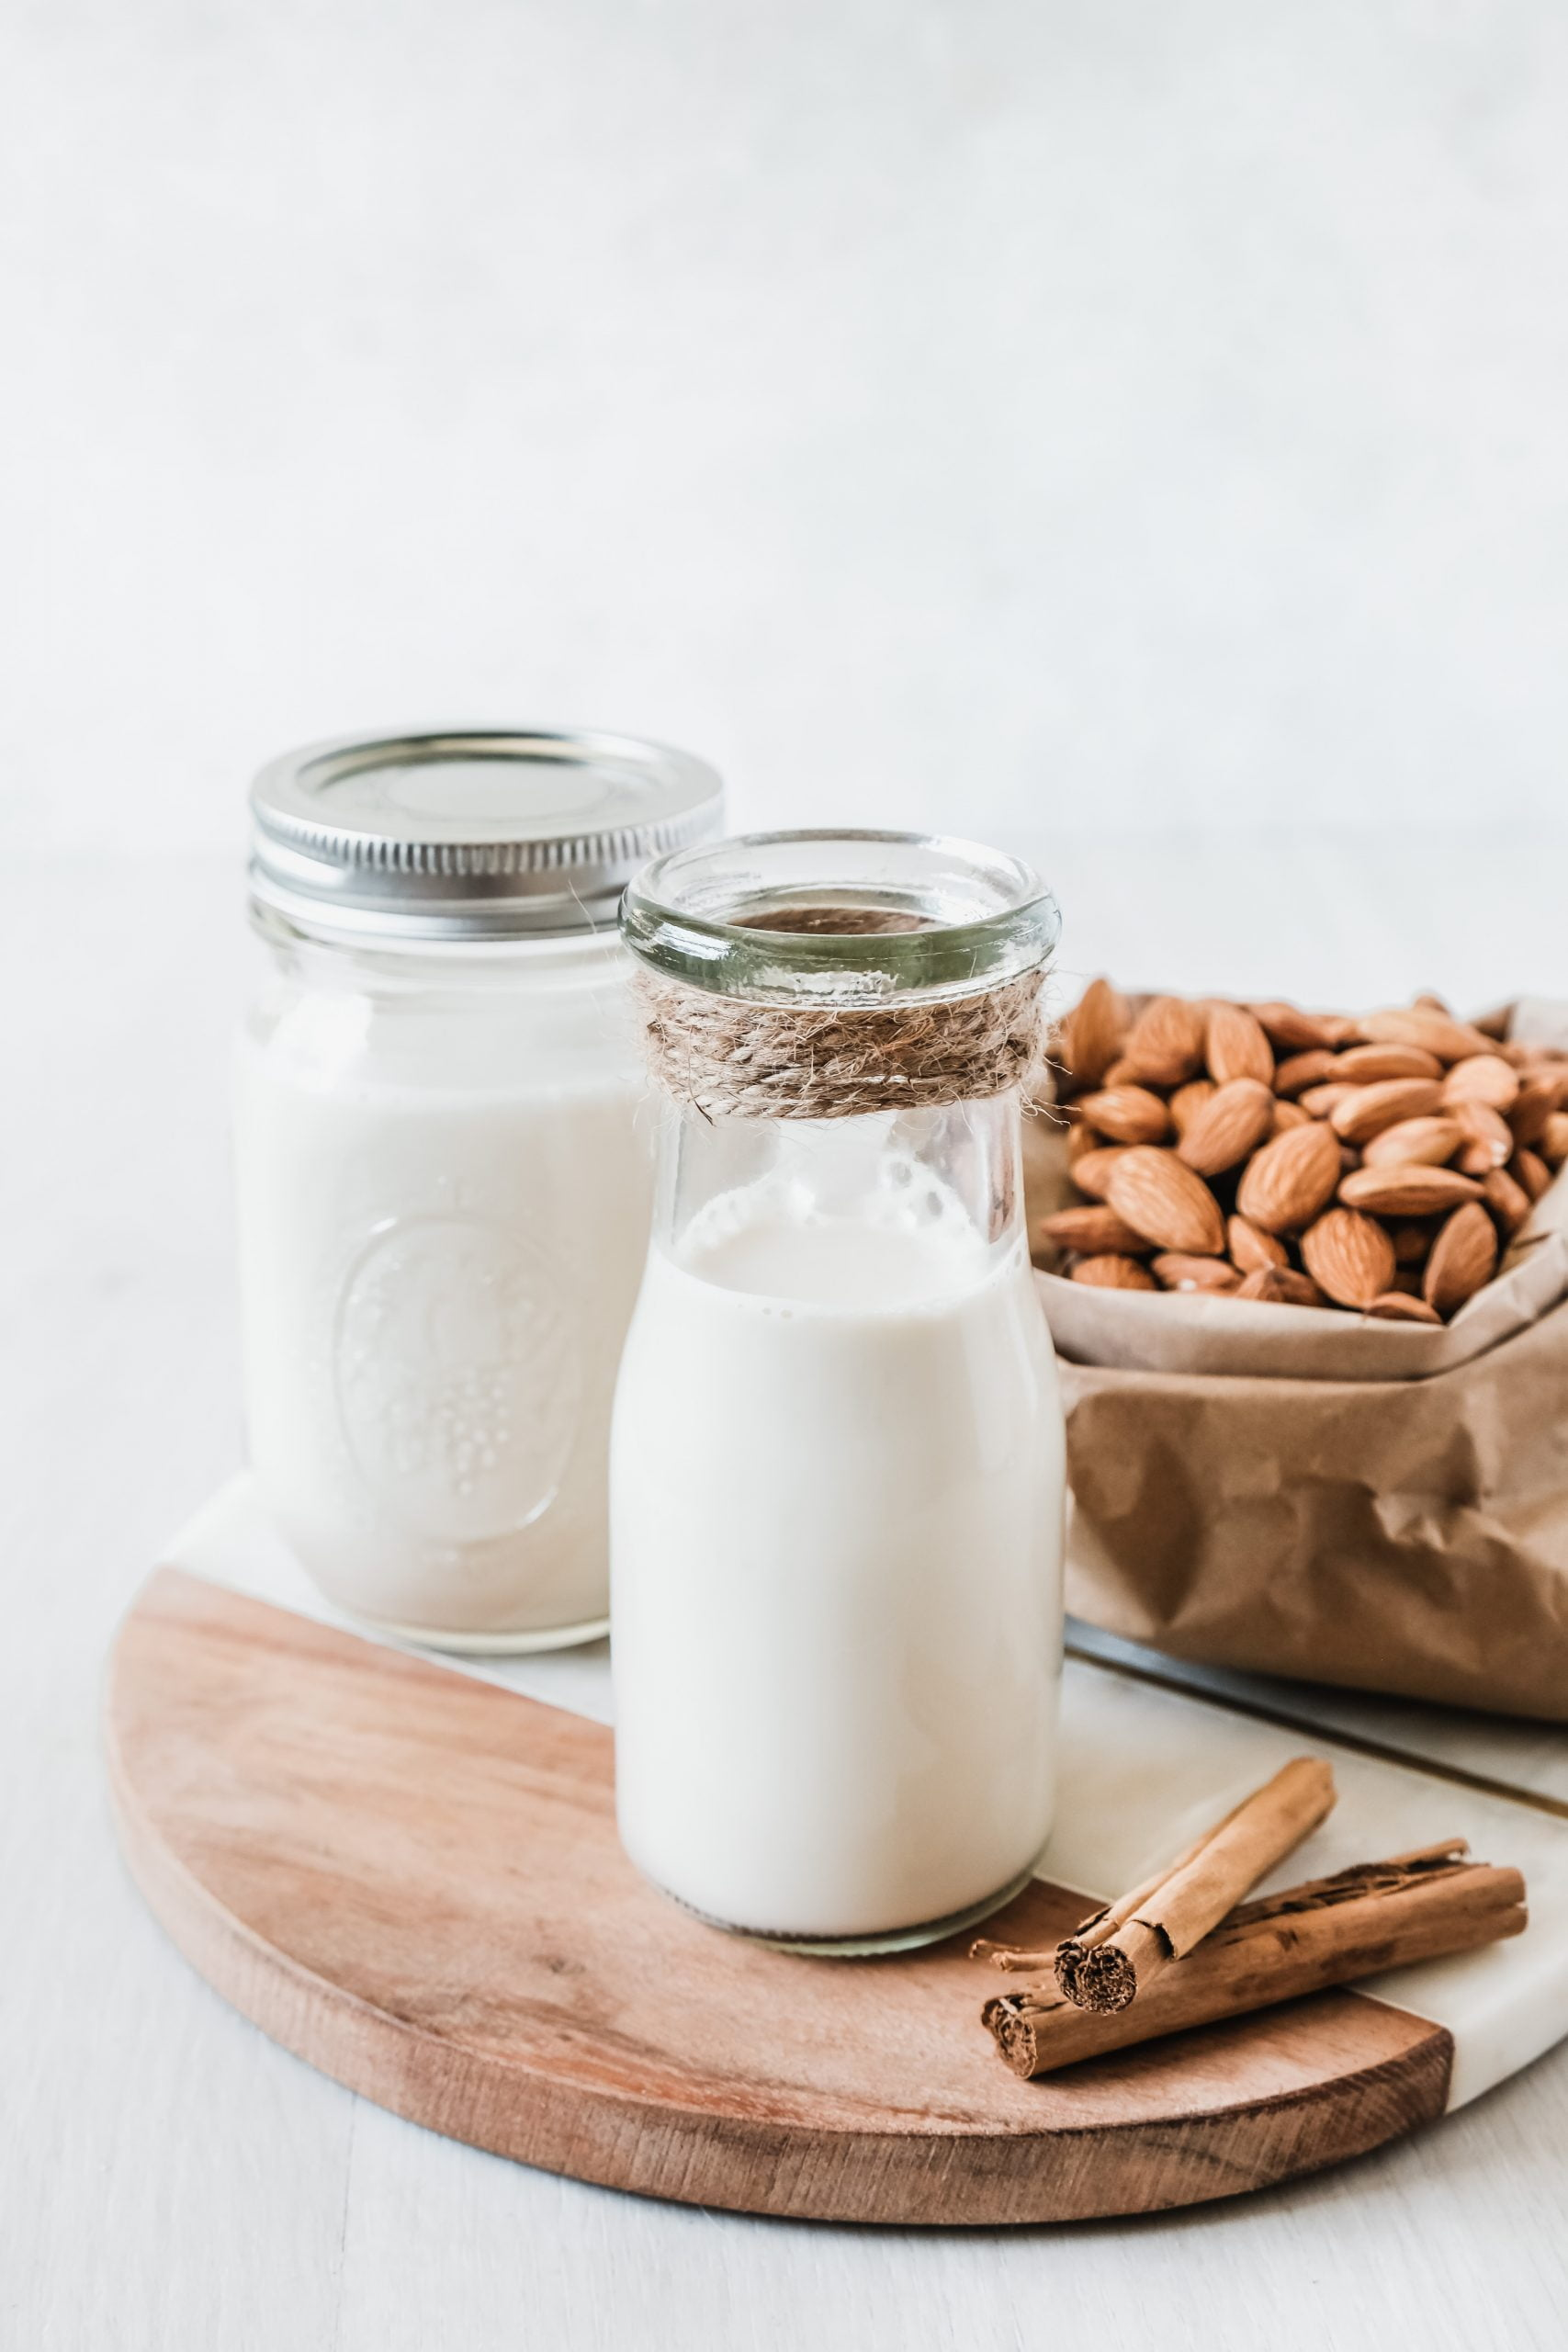 Homemade Almond Milk with Cinnamon